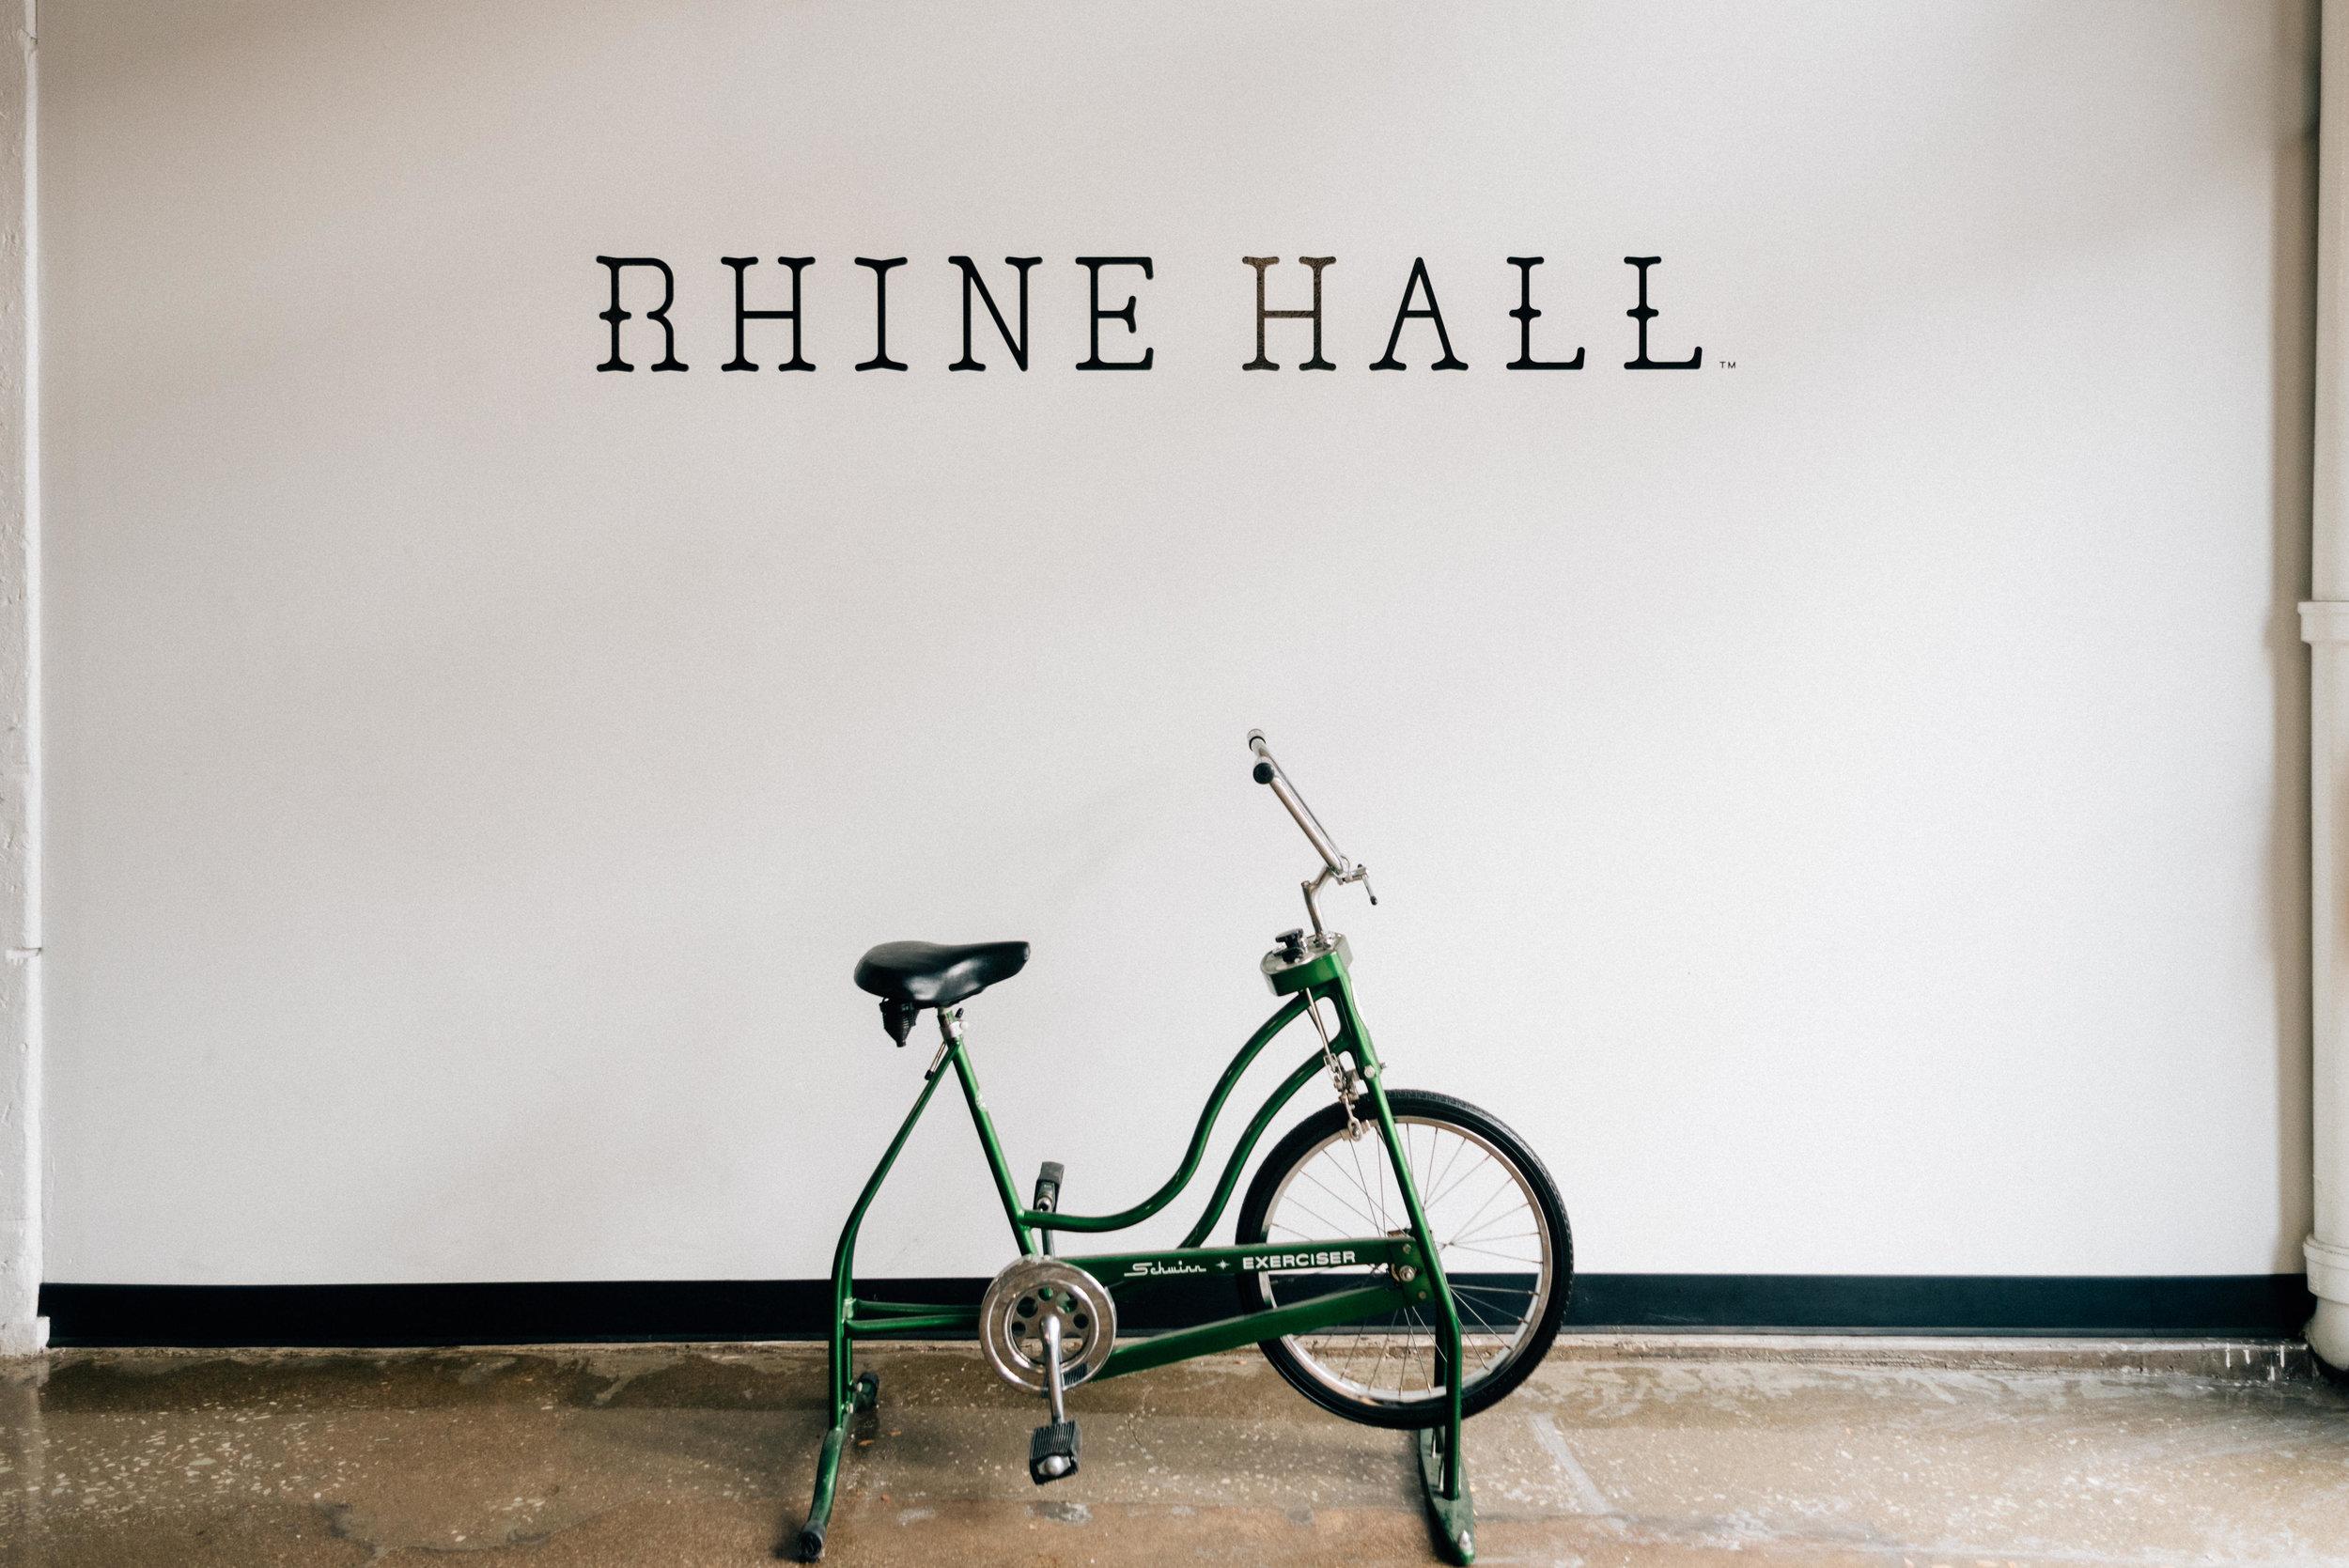 rhine-hall-chicago_tony-hughes-photography-133310.jpg